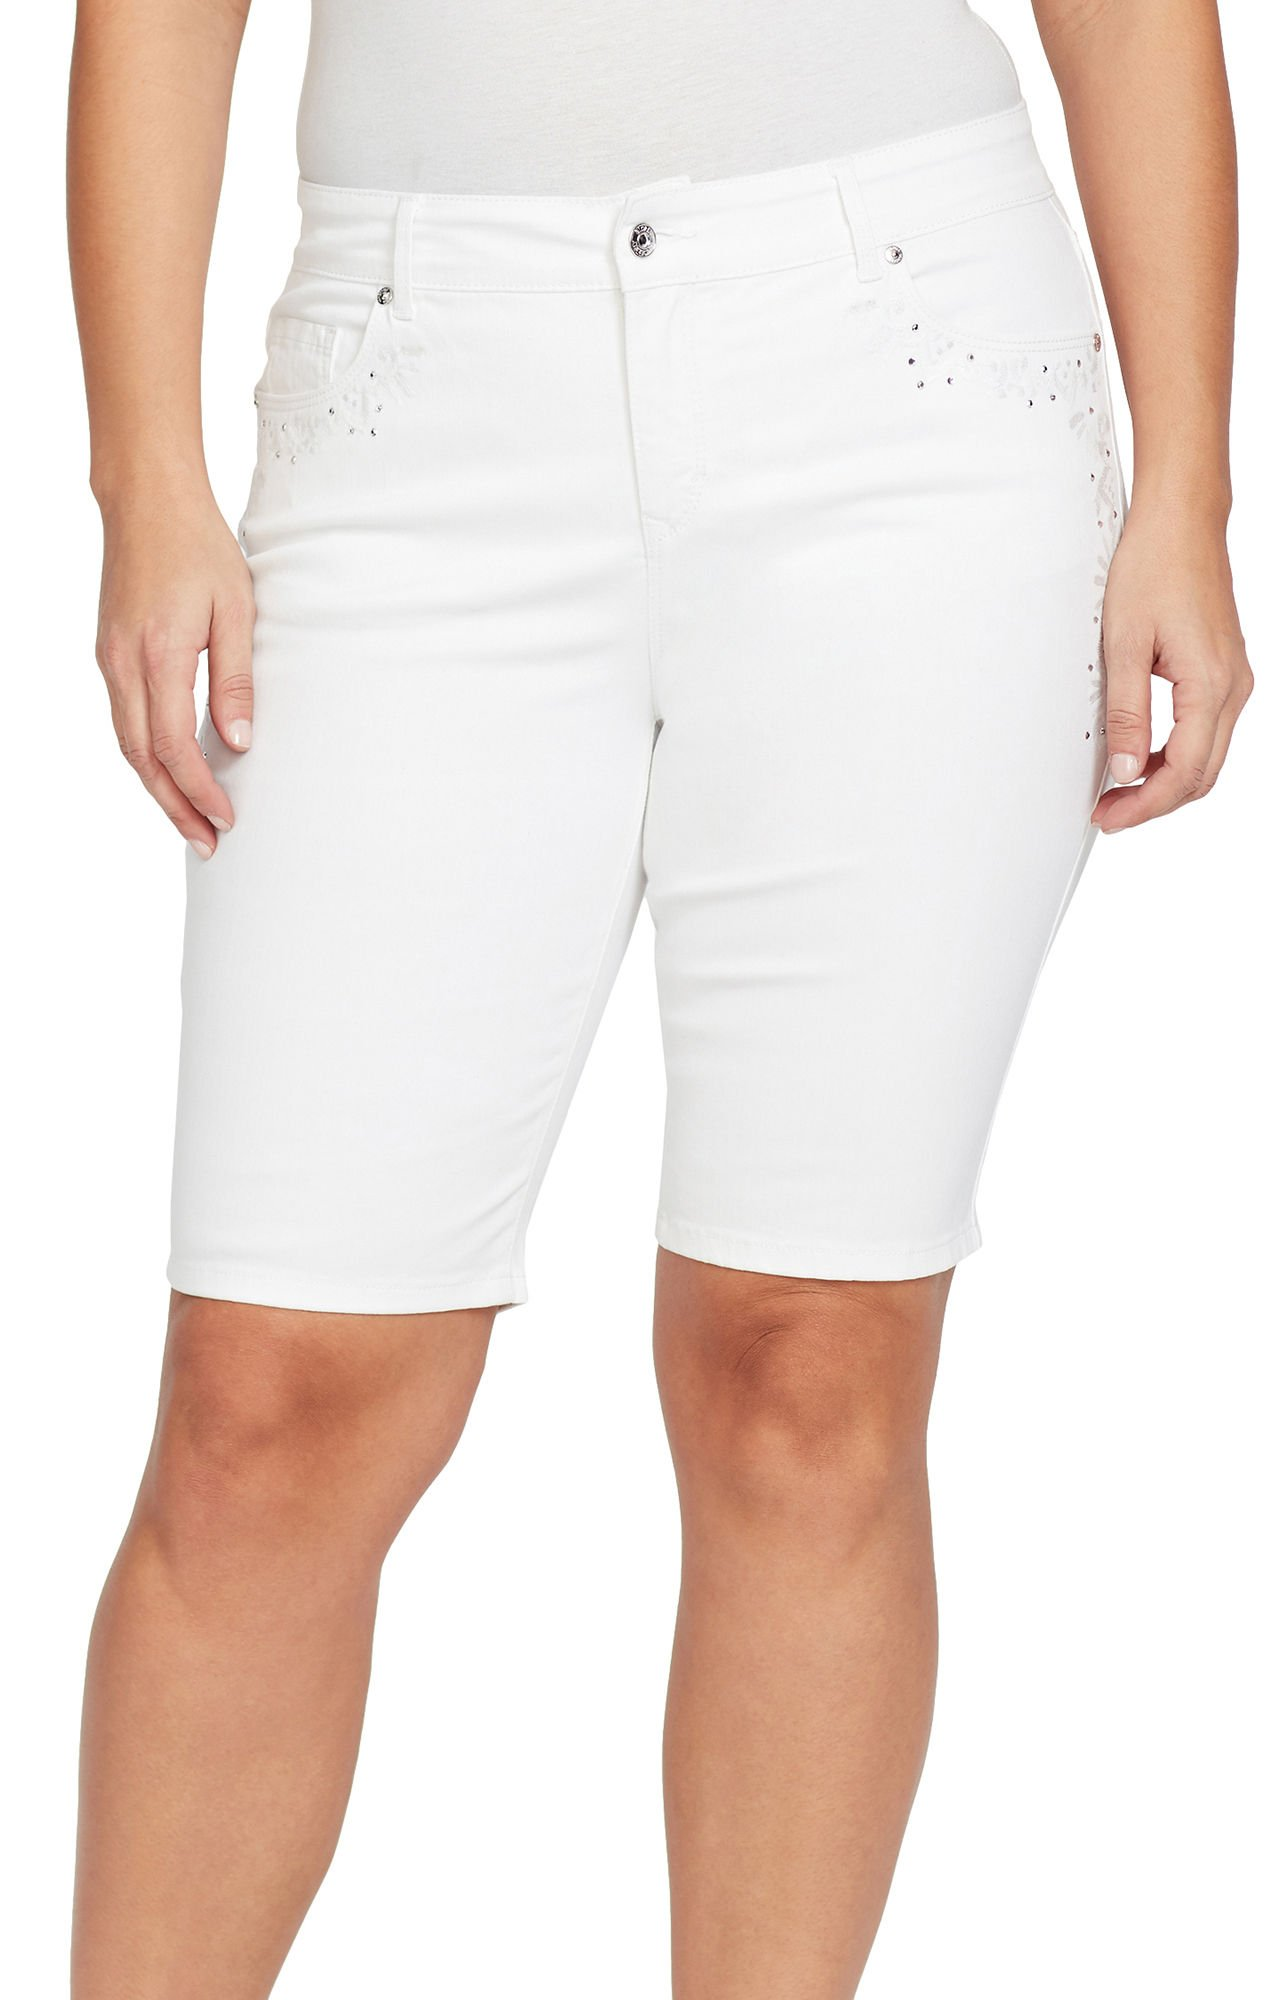 Gloria Vanderbilt Plus Jessa Bermuda Shorts 16W Crystal White